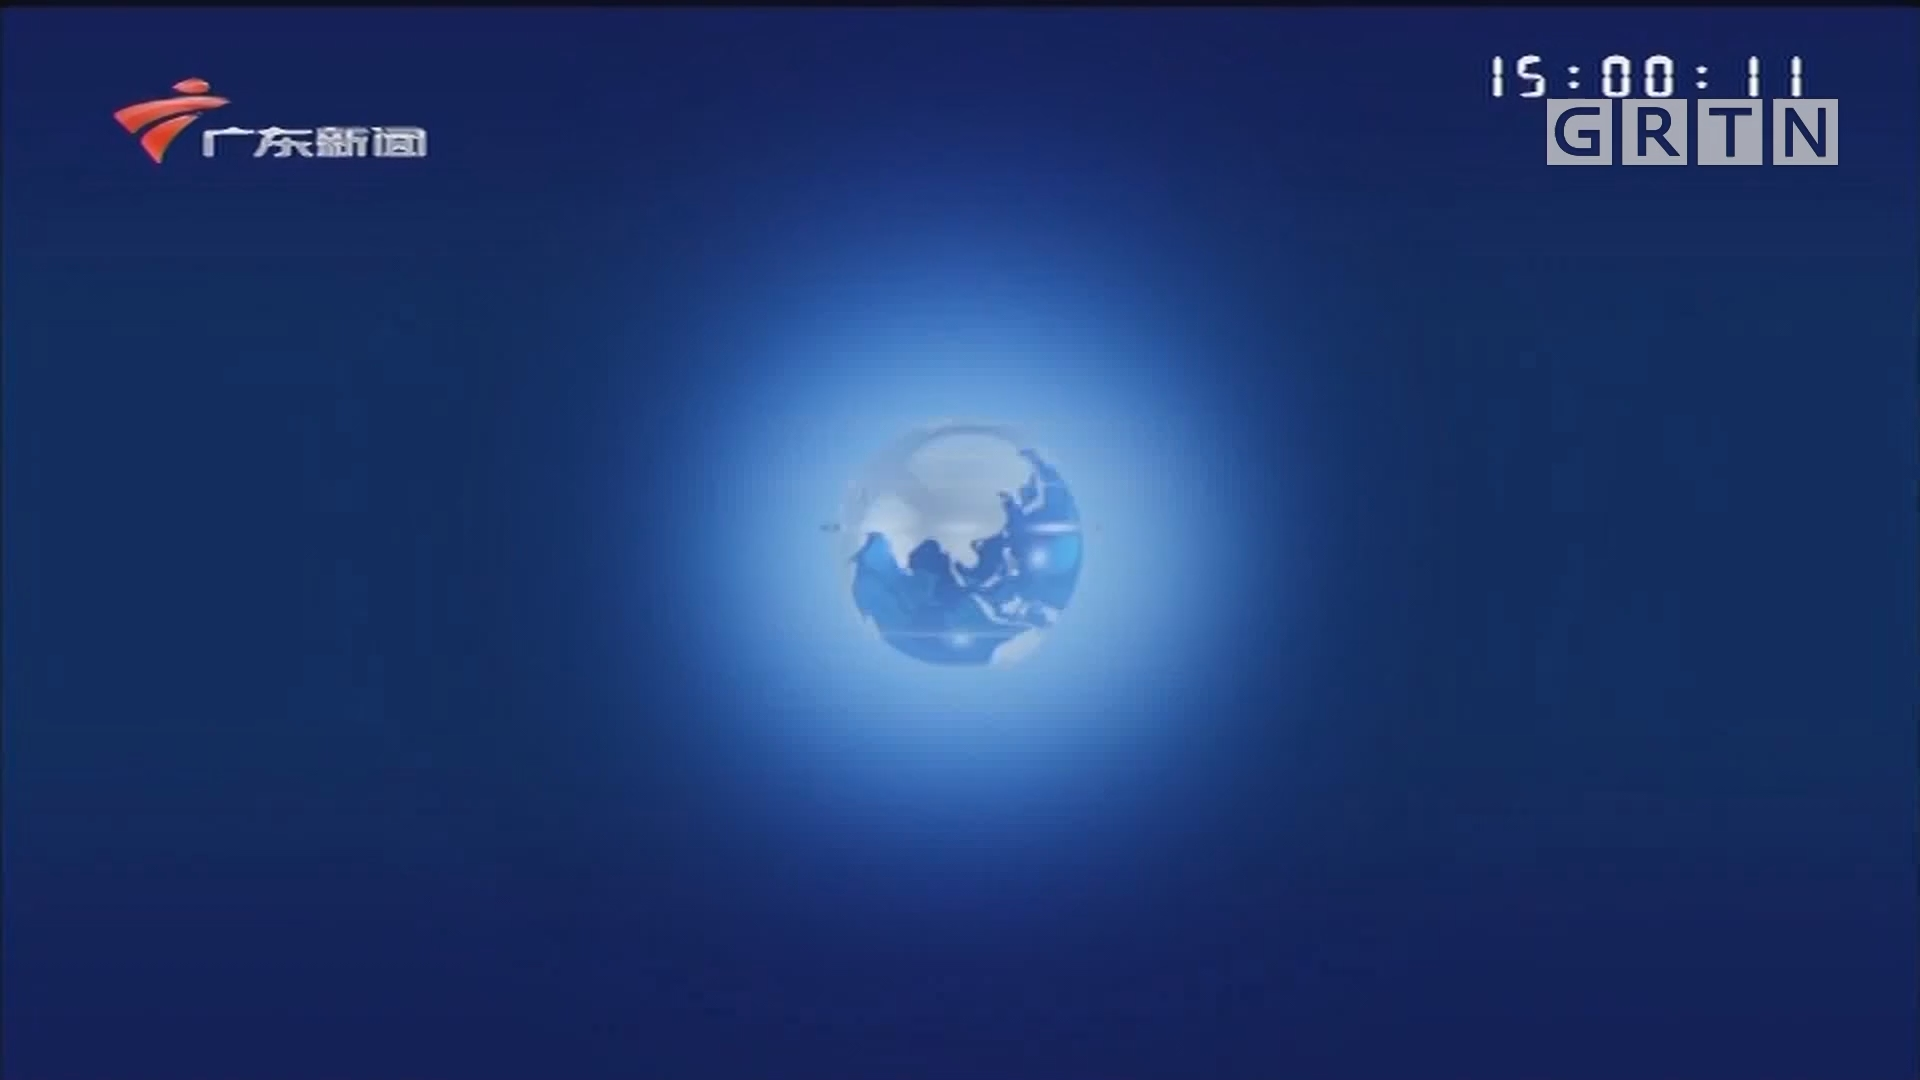 [HD][2020-01-17-15:00]正点播报:冻结涉赌资金180亿! 公安部重拳打击跨境网络赌博犯罪